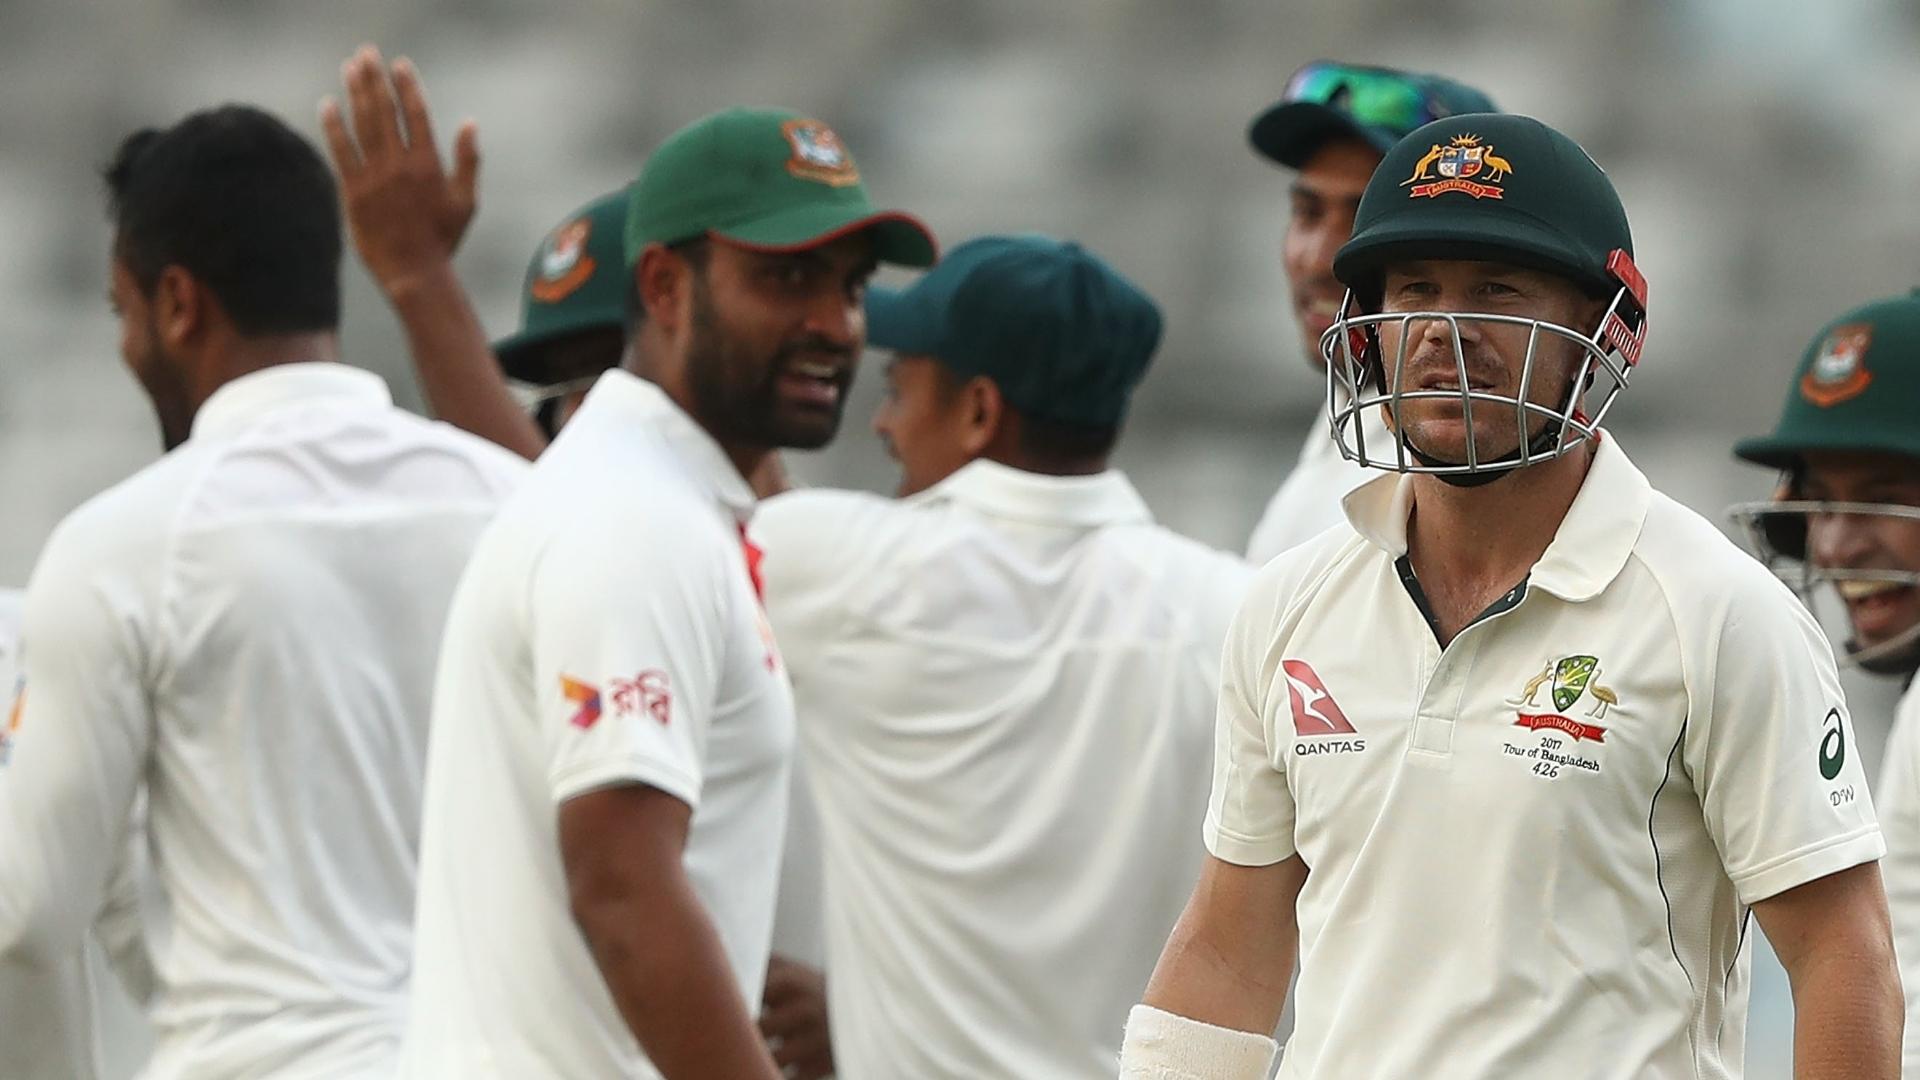 1st Test Australia Tour Of Bangladesh At Dhaka Aug 27 30 2017 Bengbeng Drink 80 Sachet Match Summary Espncricinfo